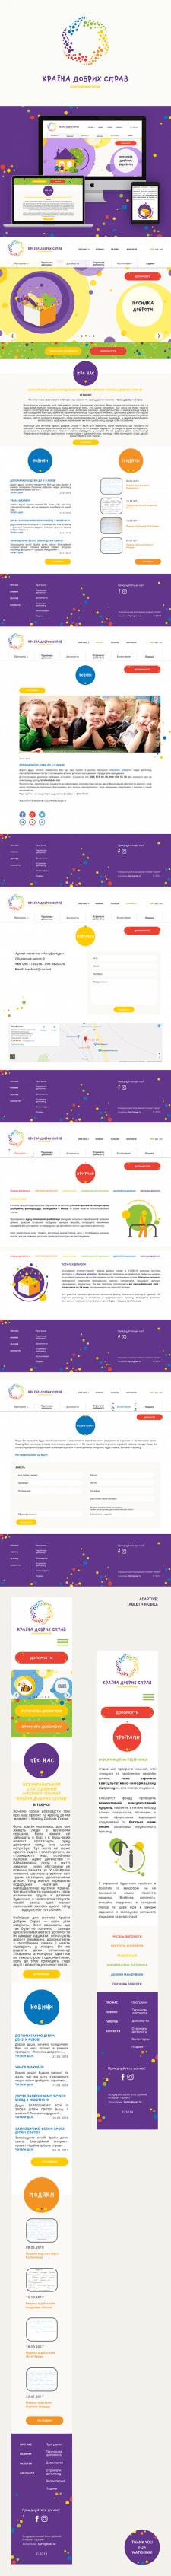 "Логотип и сайт (+адаптив) для ""Країна добрих справ"